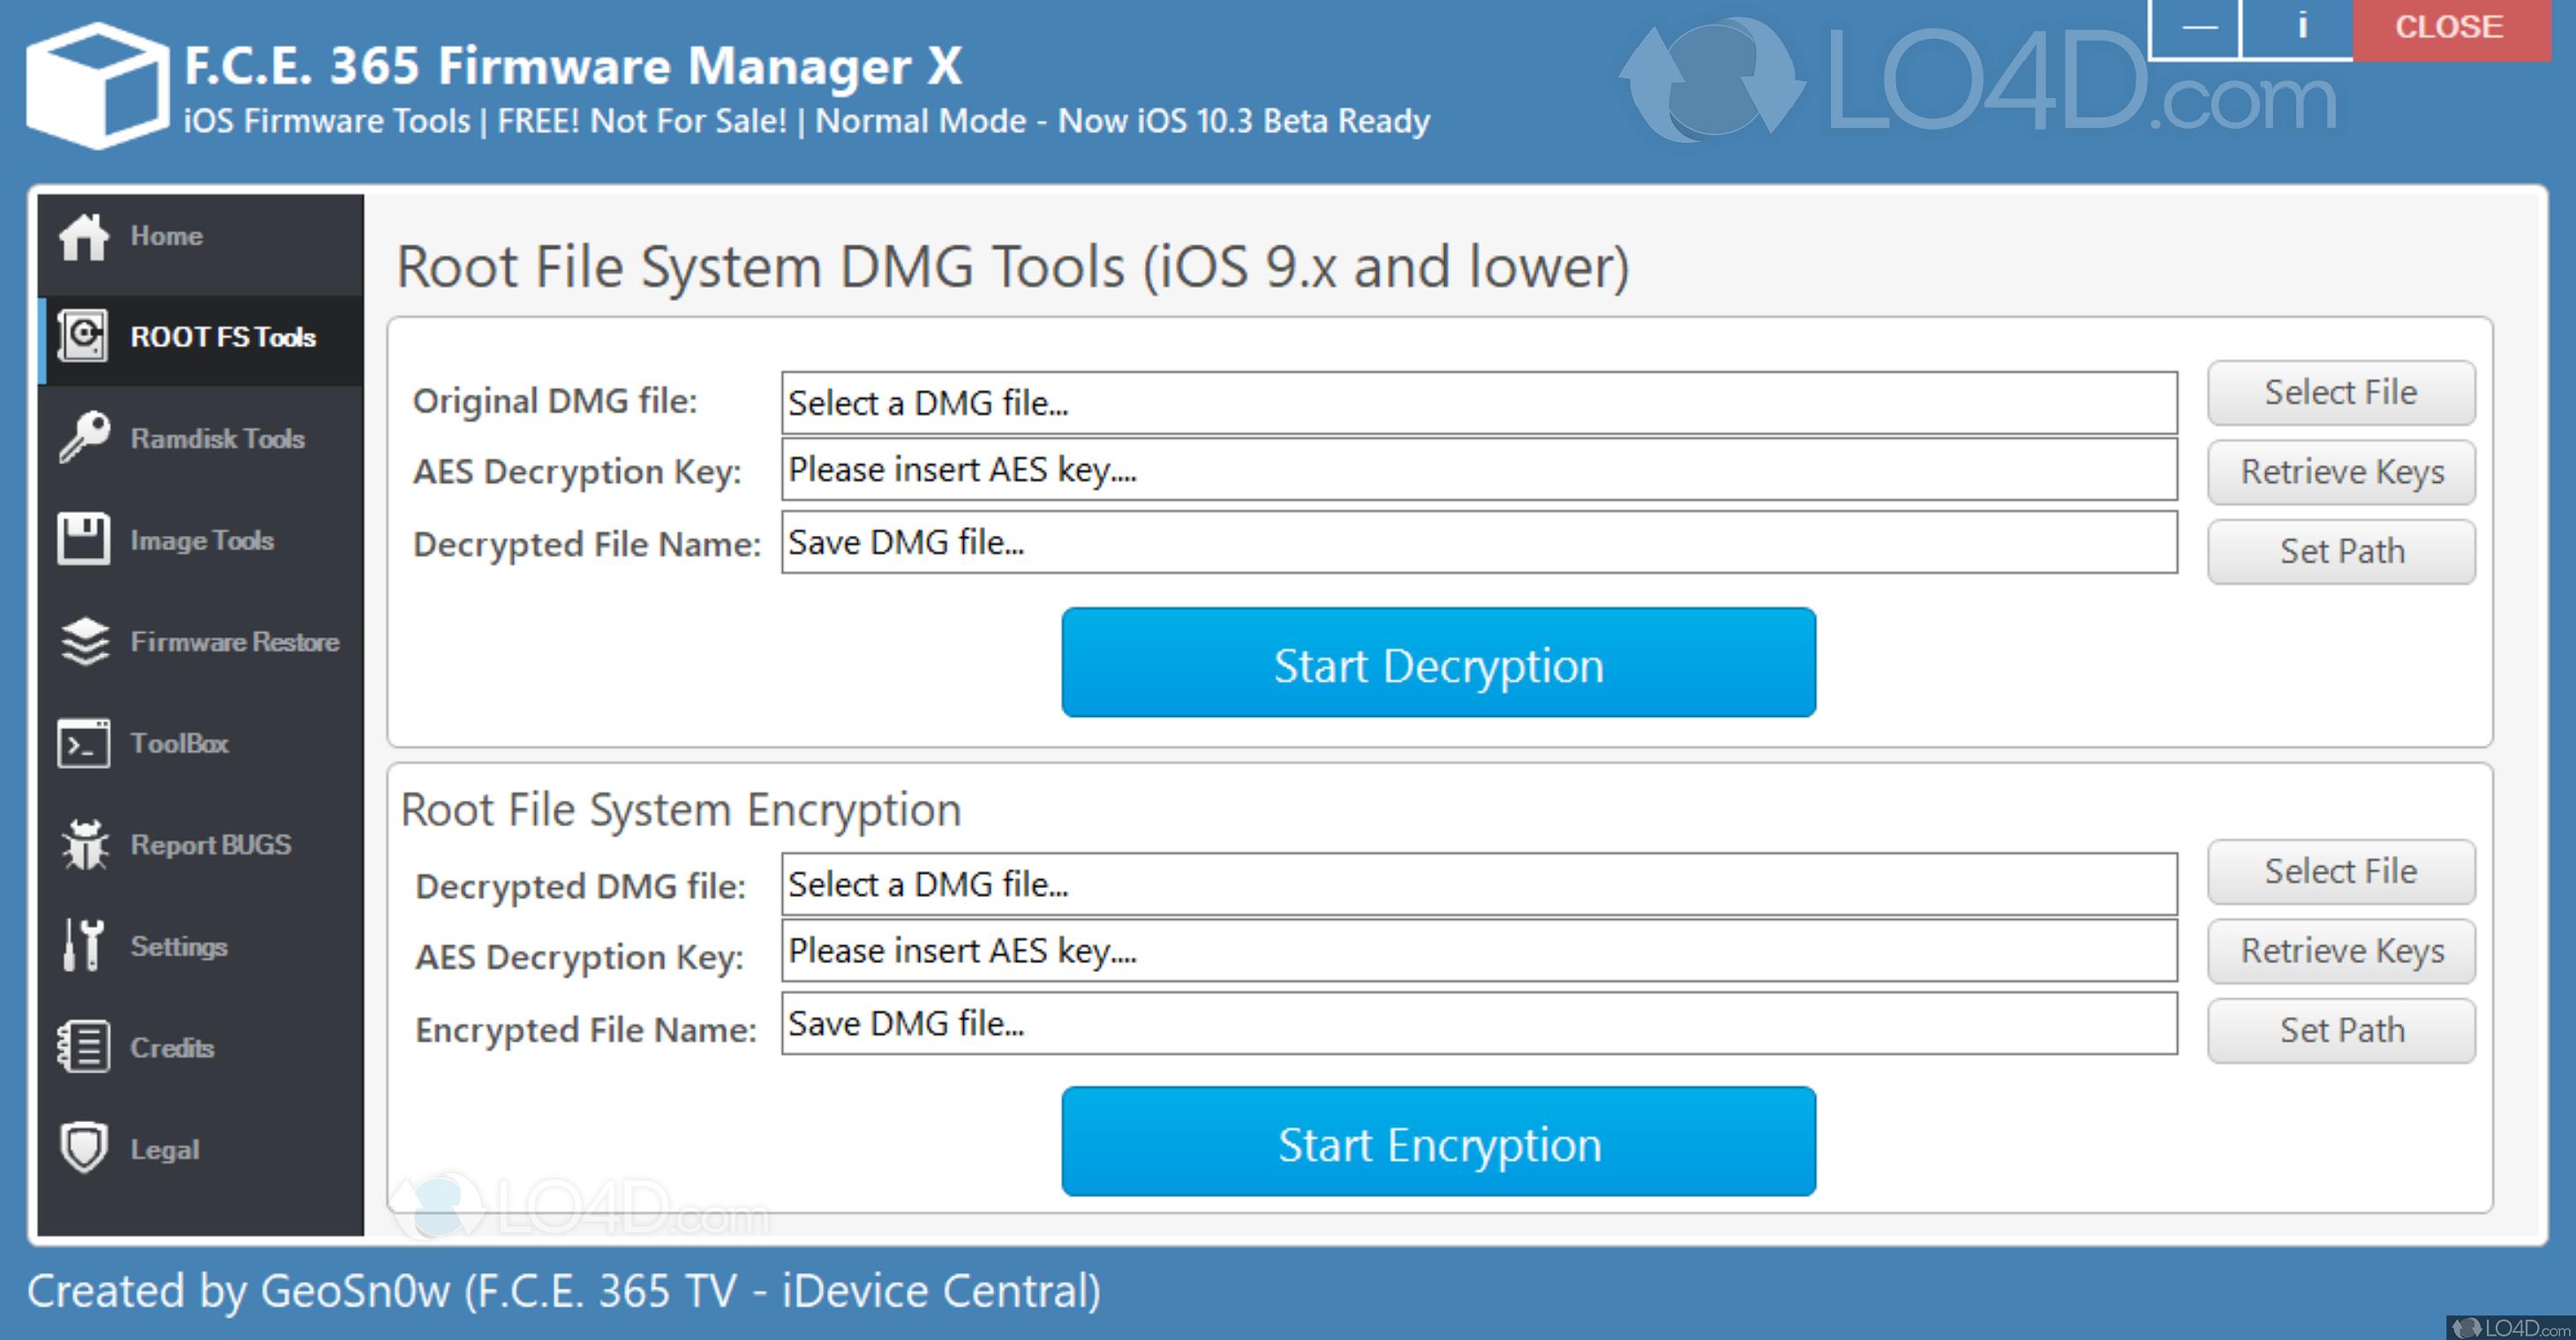 F C E  365 Firmware Manager - Screenshots